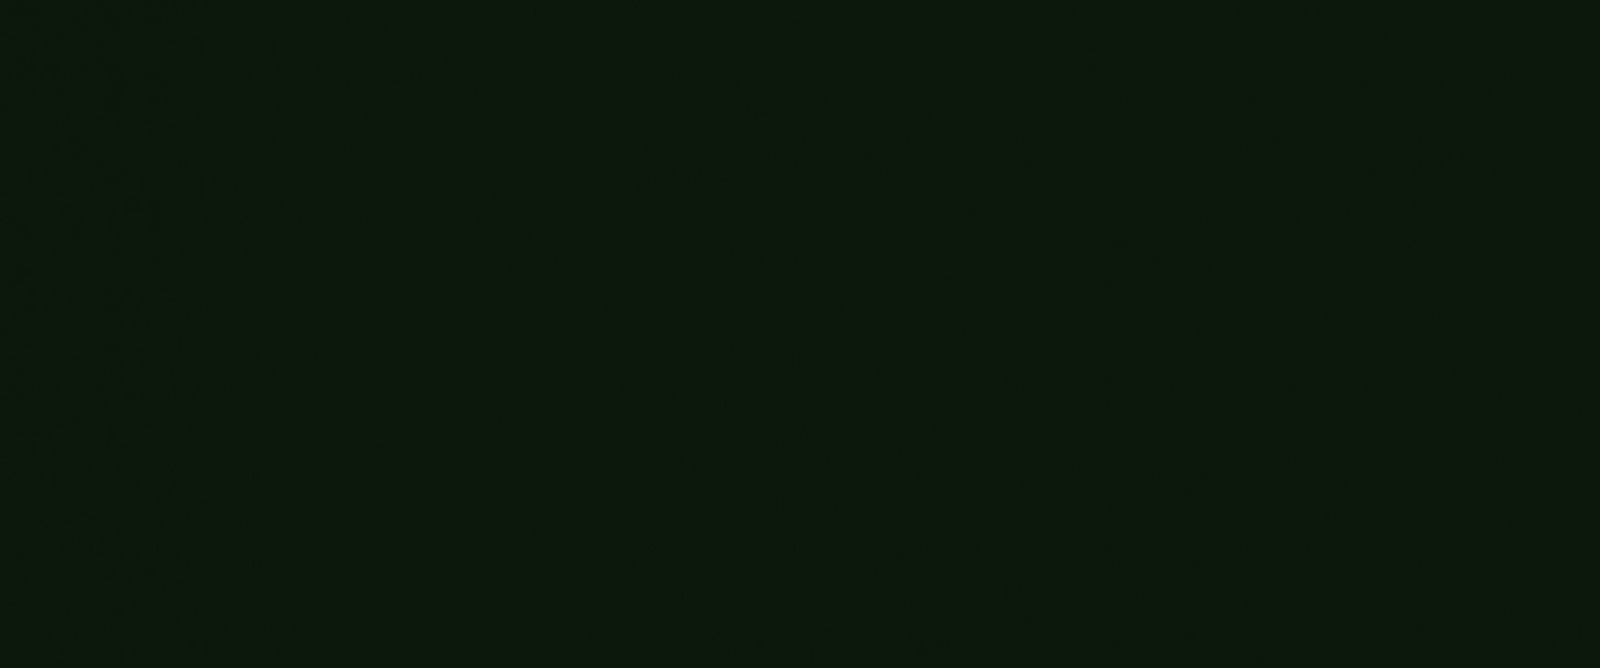 skai® cool colors PLUS tannengrün SFTN matt